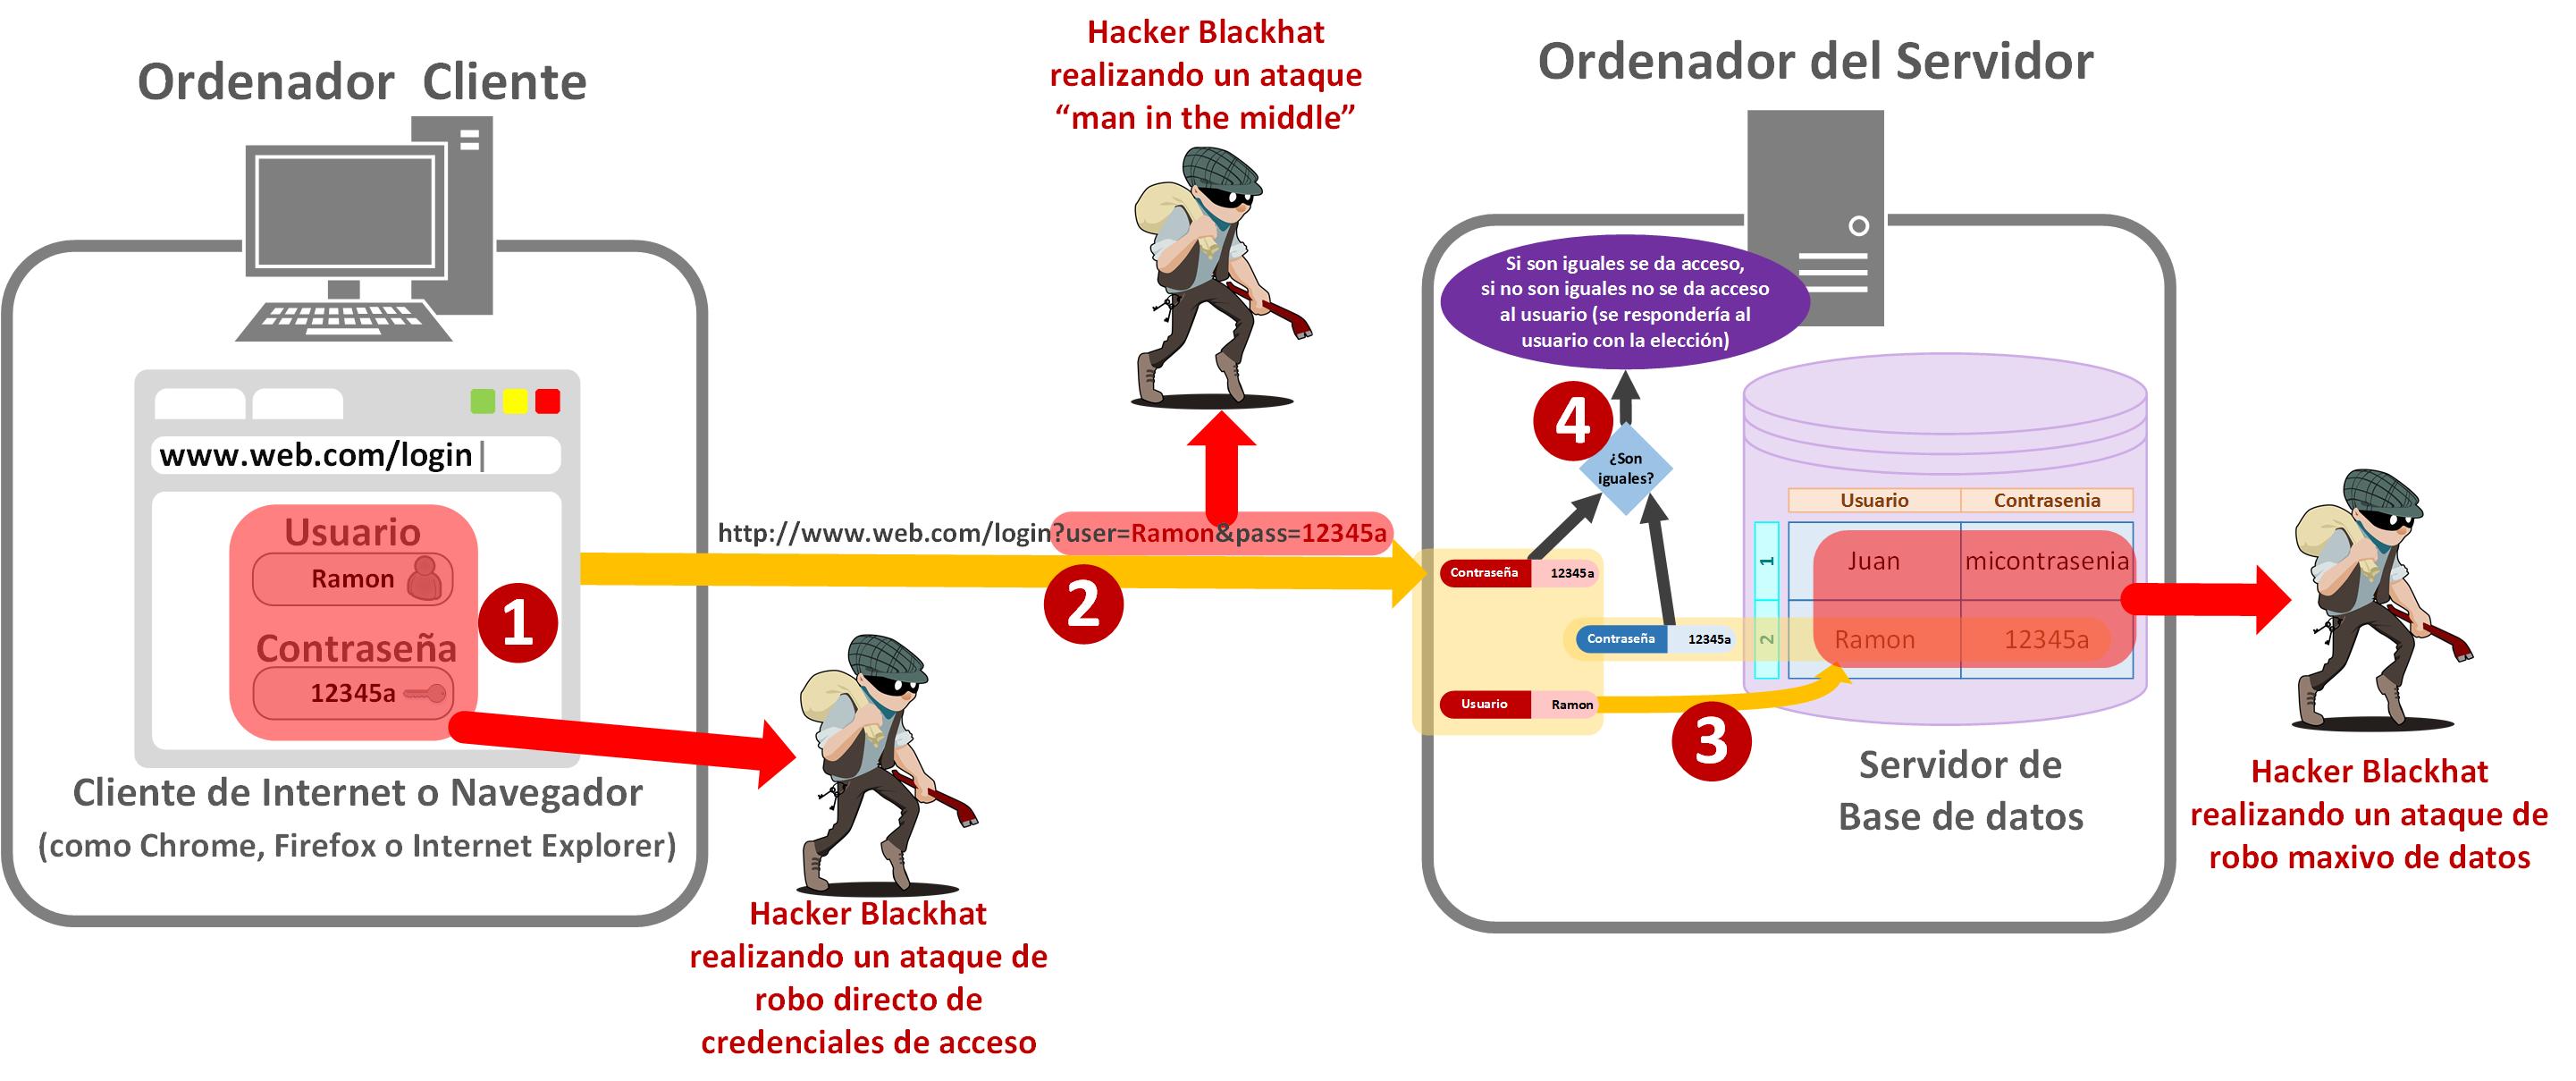 Posibles ataques para robar los credenciales - www.jarroba.com